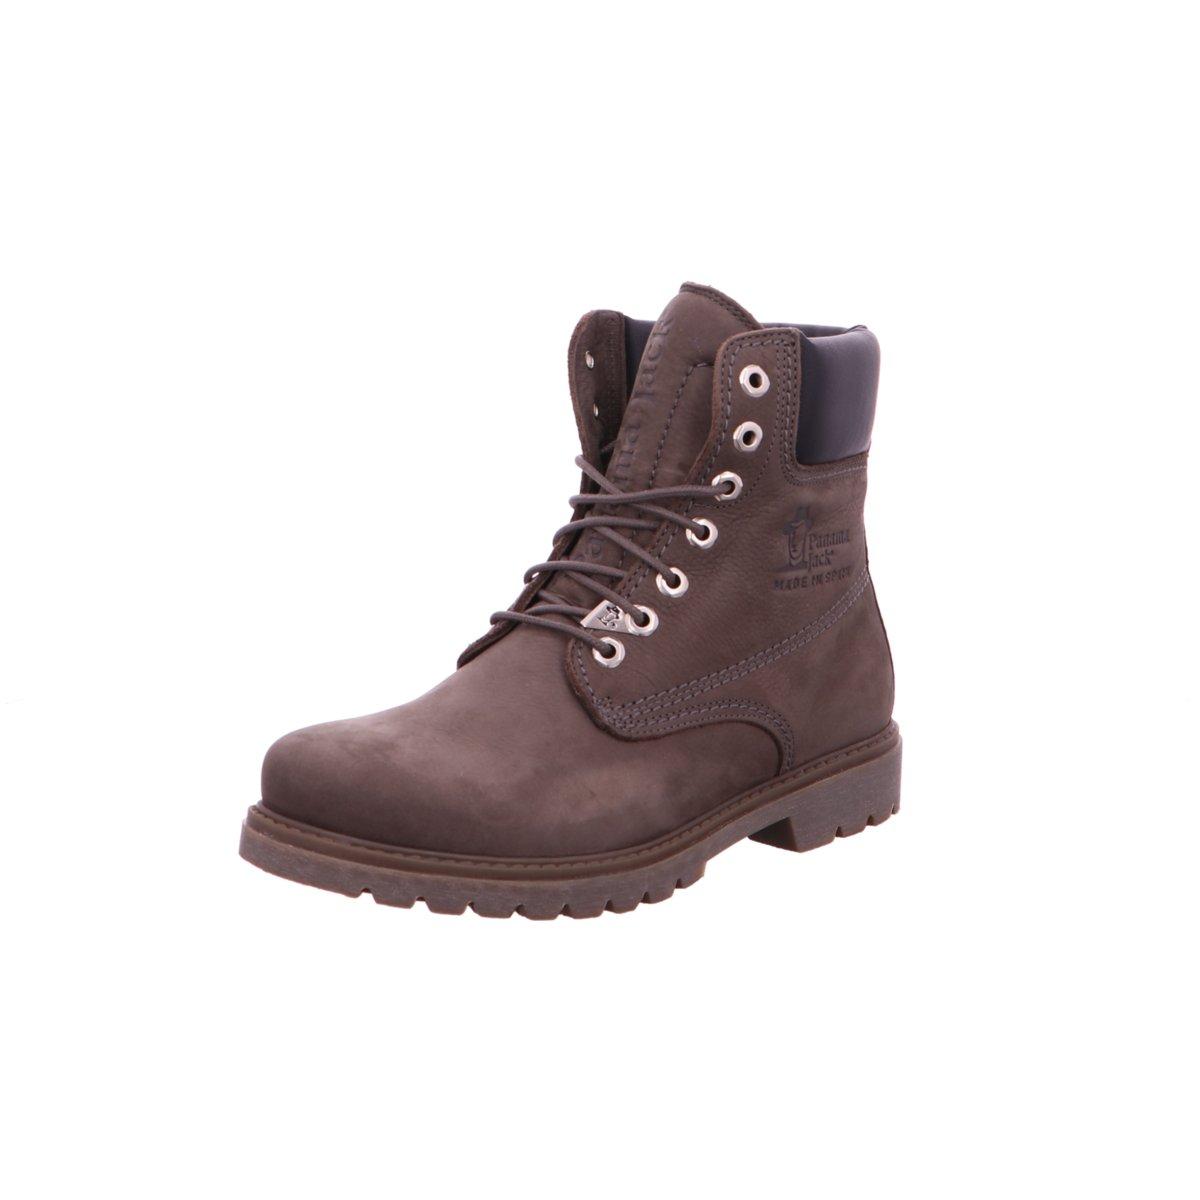 e206bb5e8226ea Panama Jack Herren Stiefel Nubuck gris Panama 03 Wool C14 grau 355490